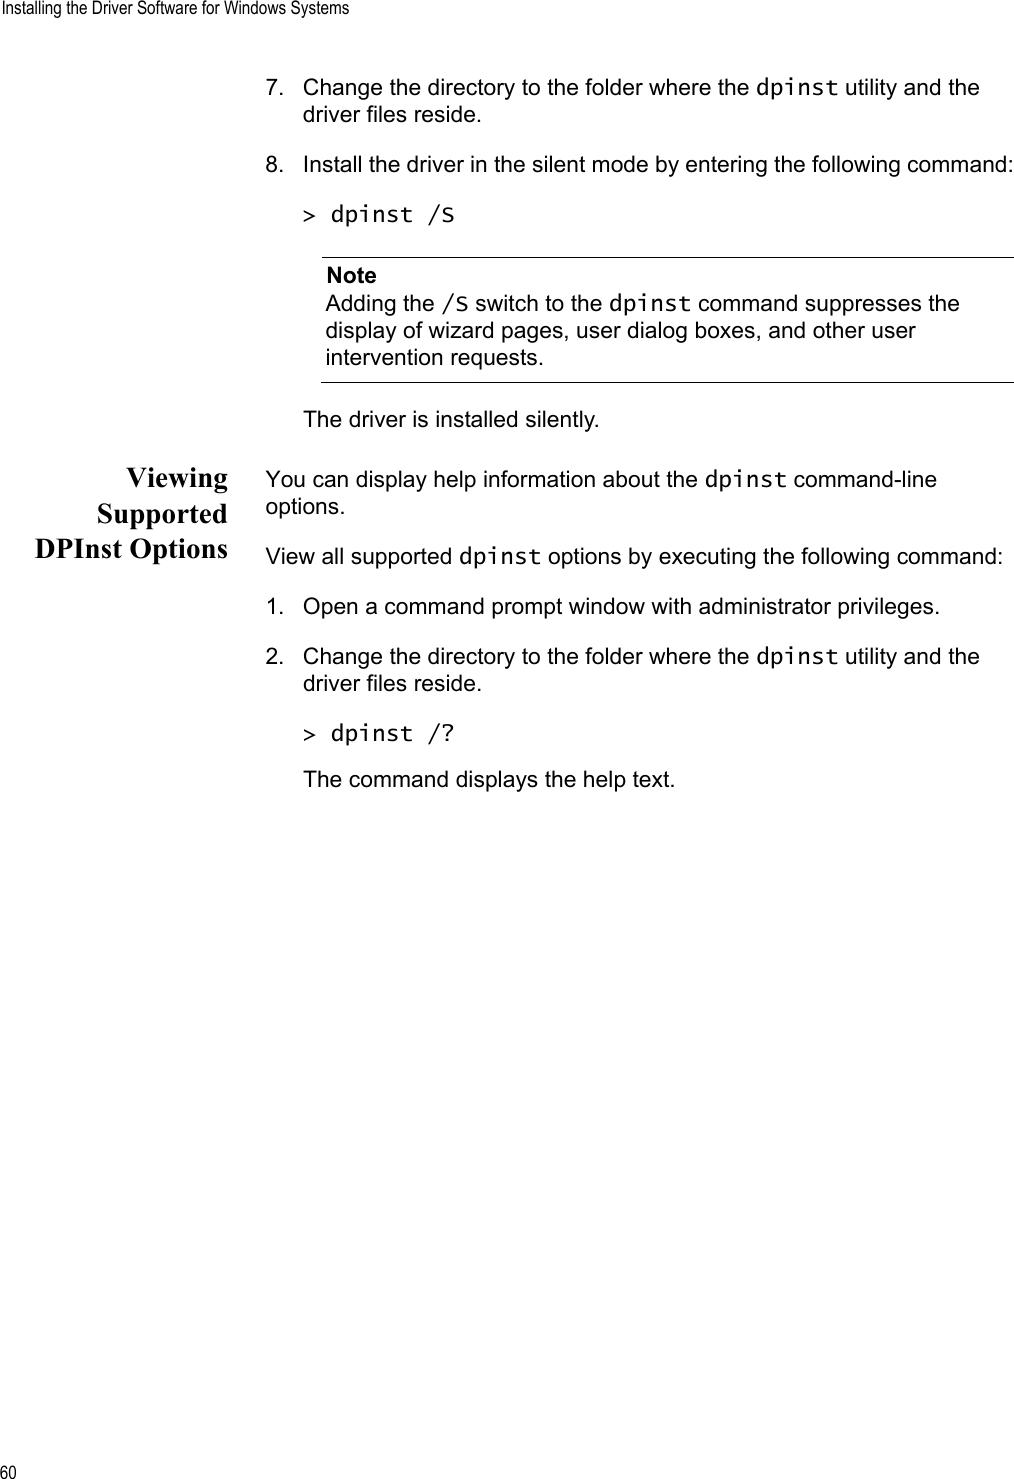 Allied Telesis Network Card At 2711Fx Lc Users Manual At2711vb